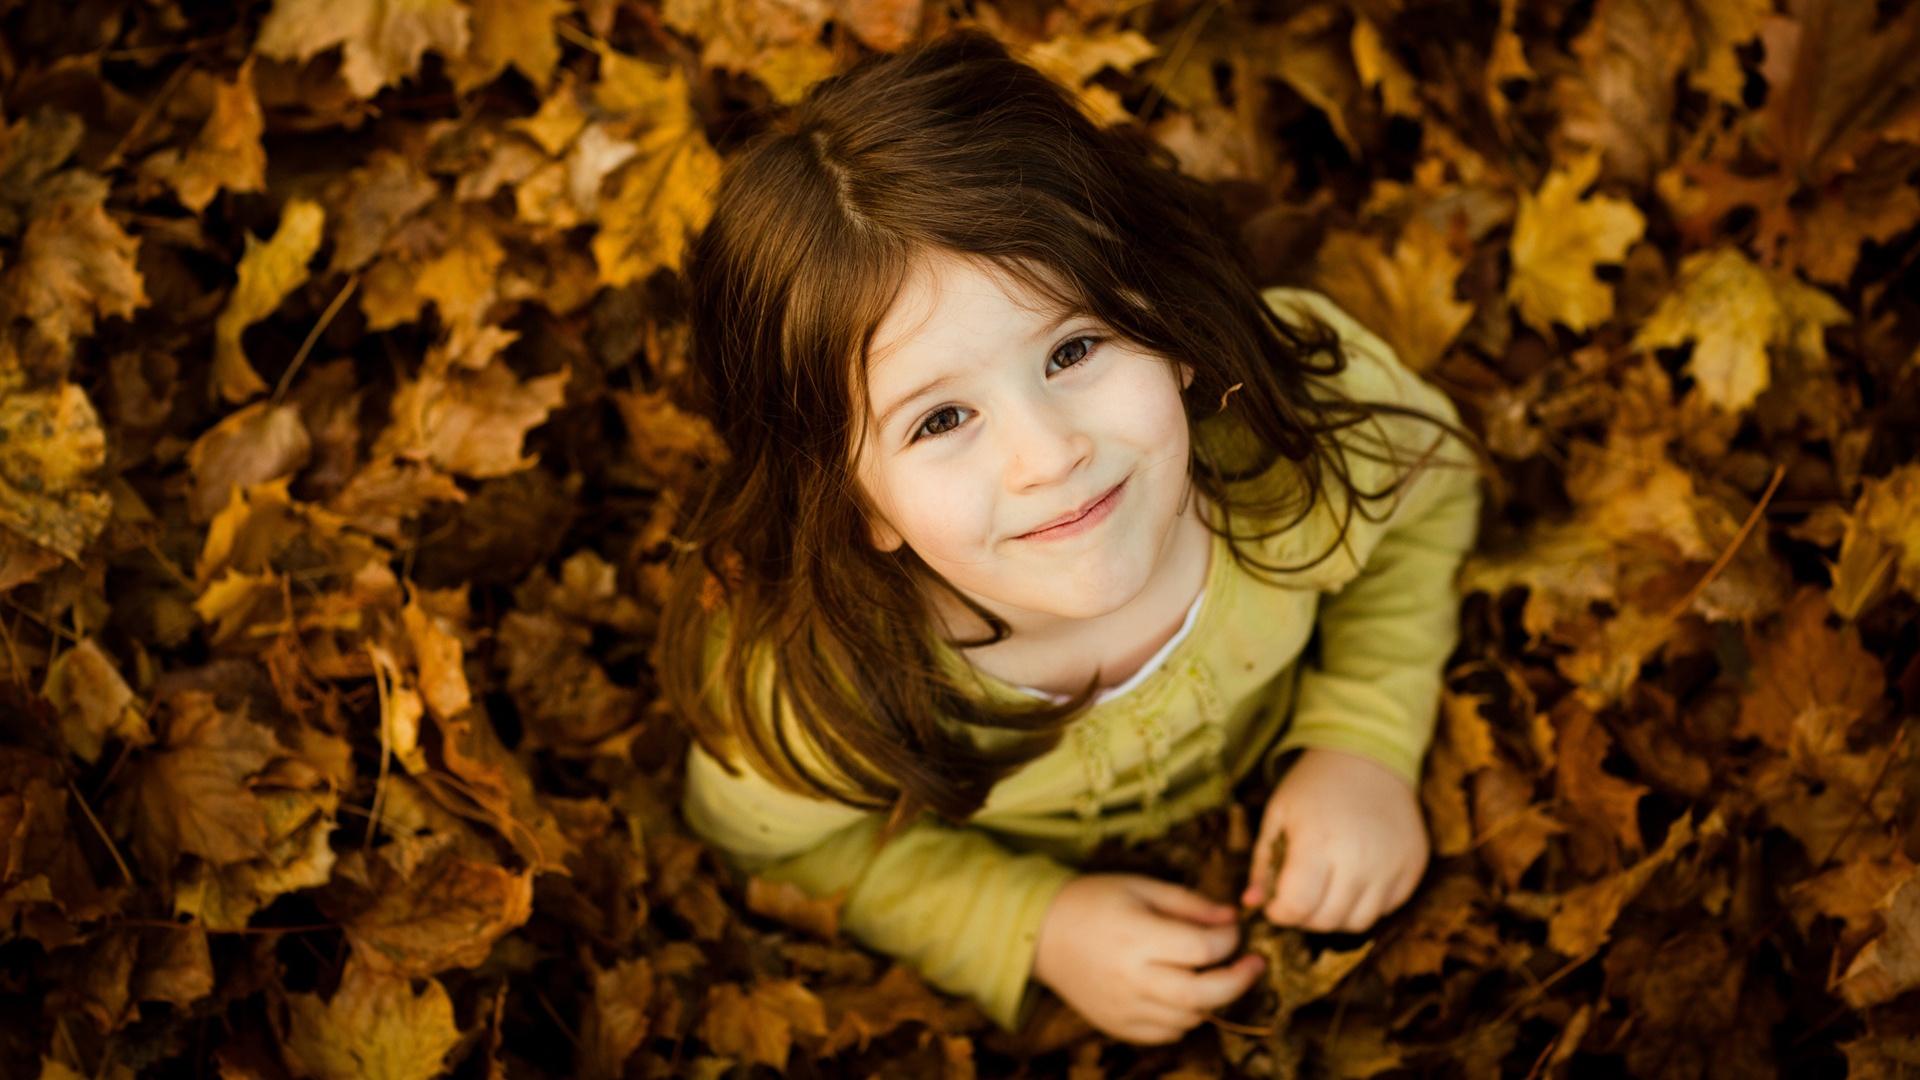 Cute images for girls free download   pixelstalk. Net.